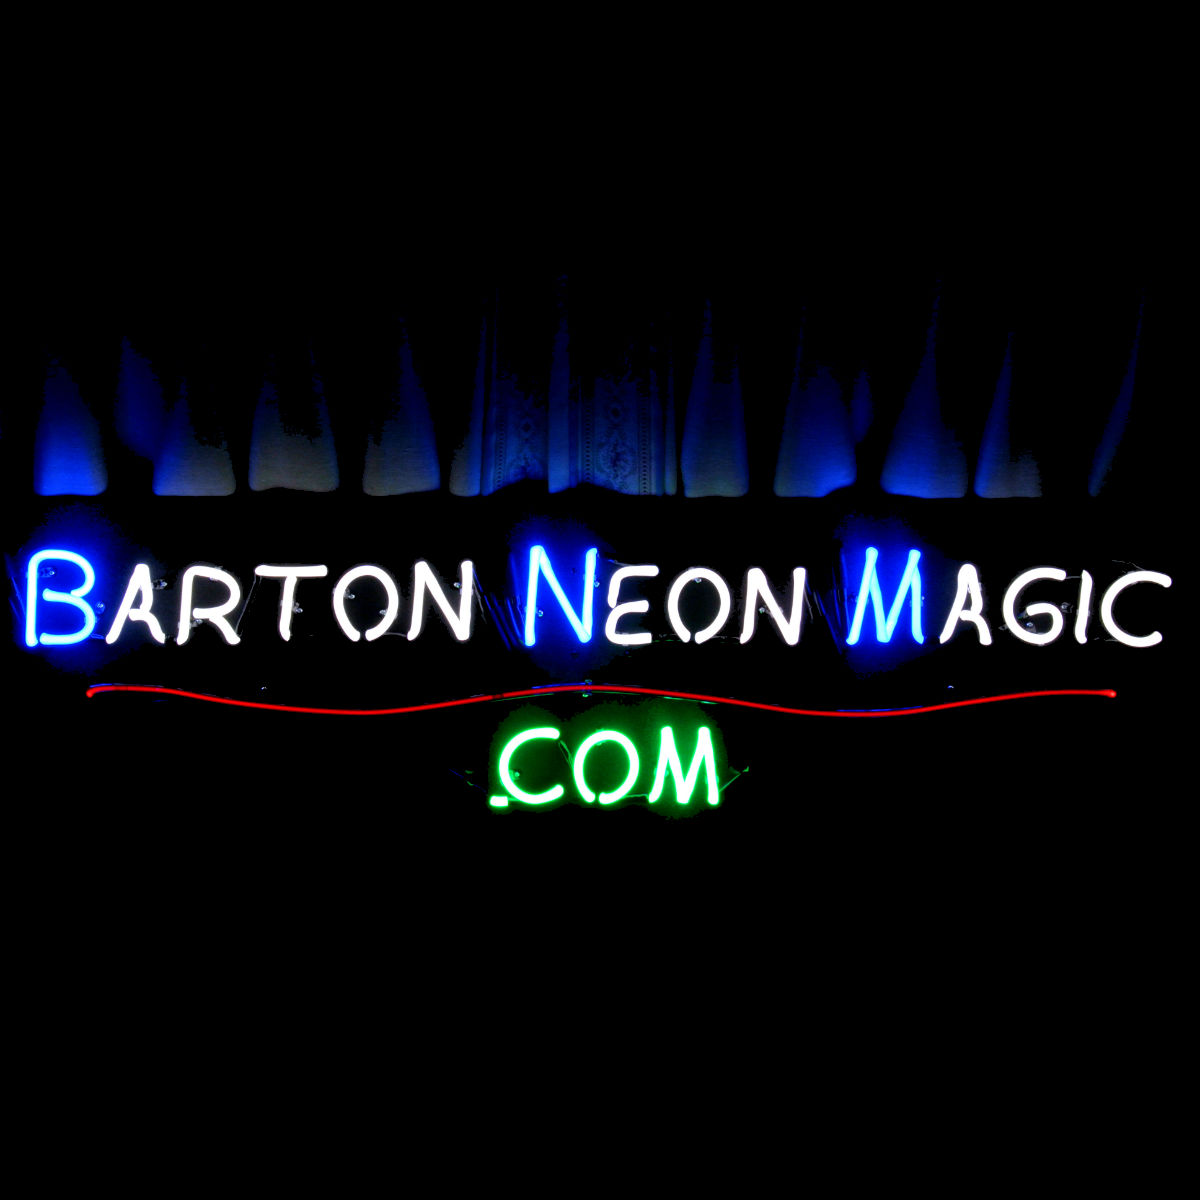 Unique gift ideas for musicians - DAZZLING CUSTOM NEON LIGHTING - by John Barton - BartonNeonMagic.com